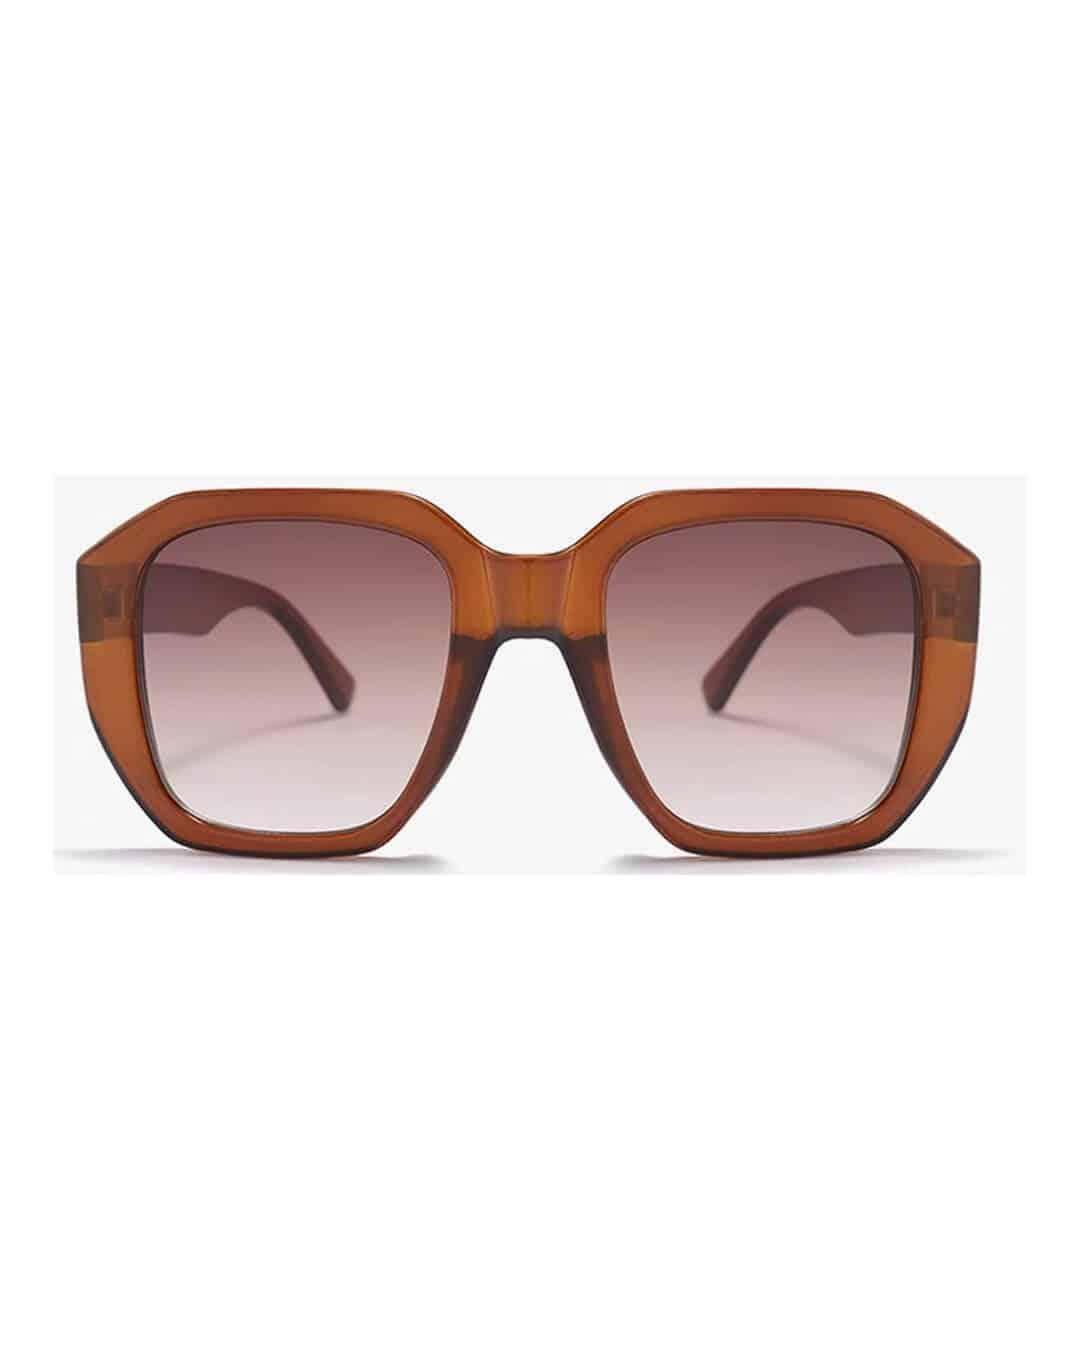 Ming-Shades-Colour-Brown